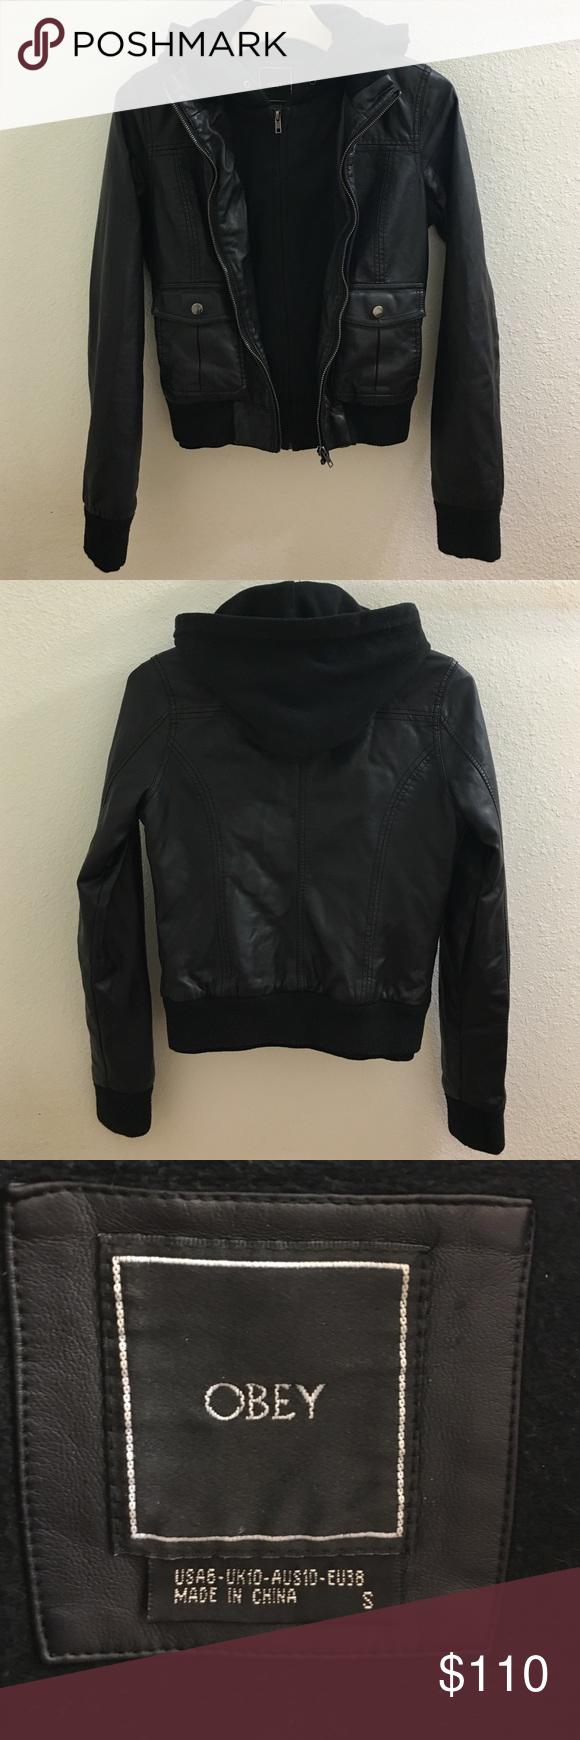 Lock And Love Women S Removable Hoodie Motorcyle Jacket Xs Black Jaquetas Femininas Roupas Roupas Pretas [ 1944 x 1500 Pixel ]